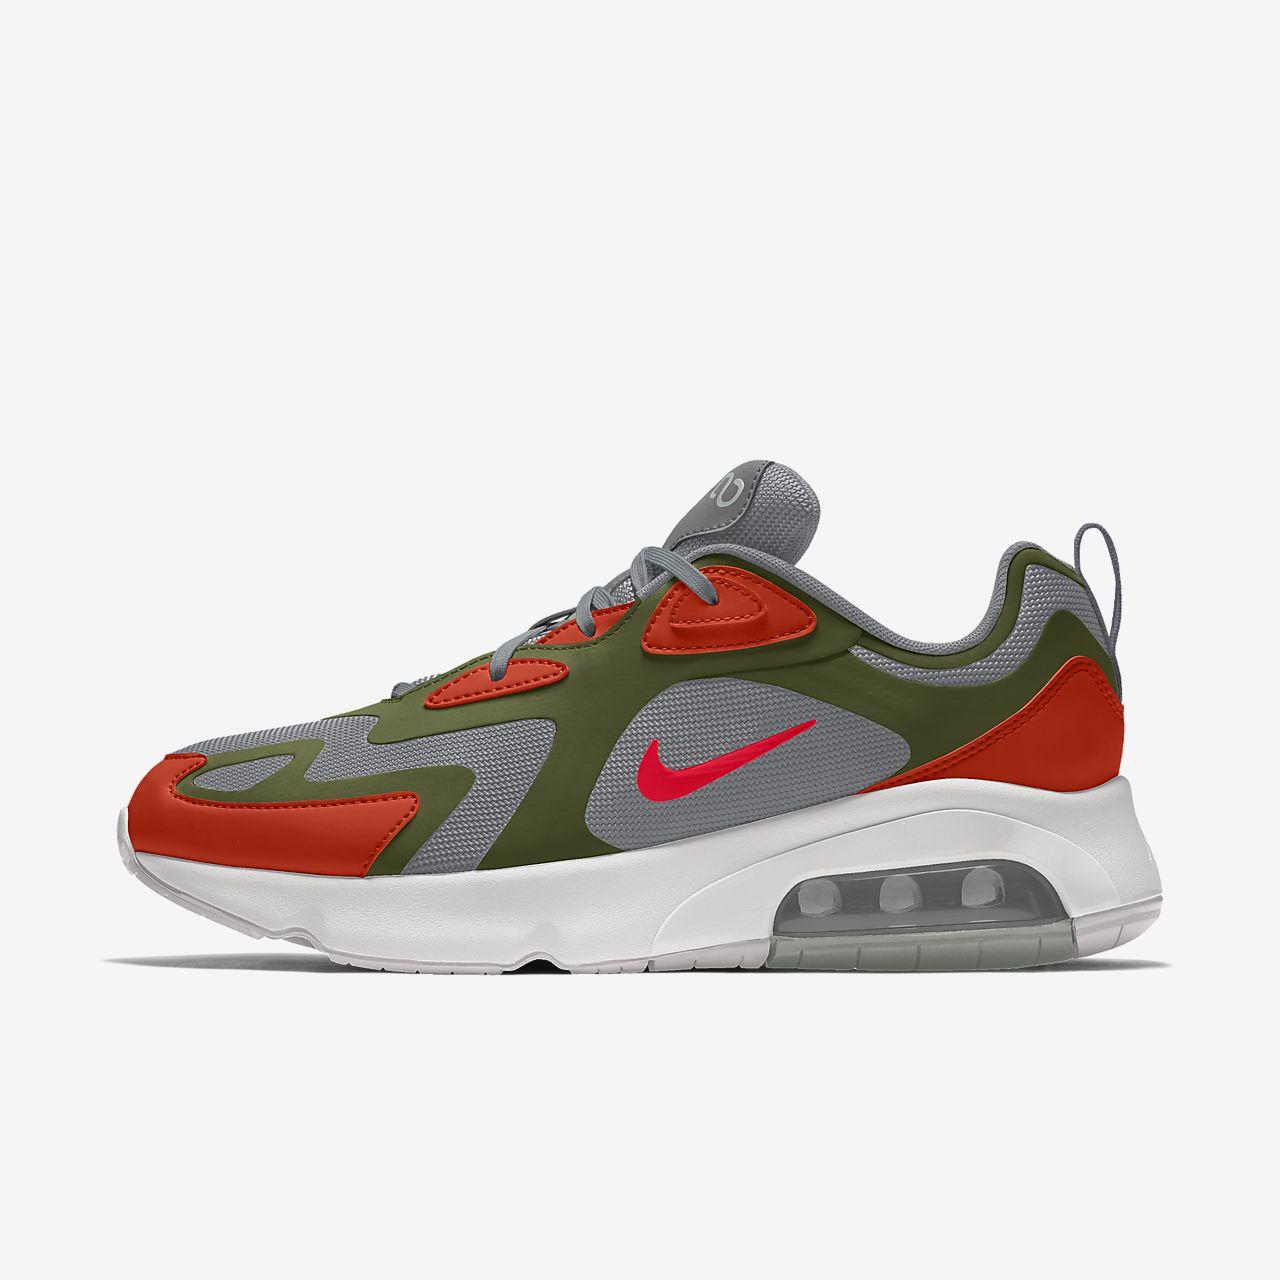 Damskie personalizowane buty Nike Air Max 200 By You